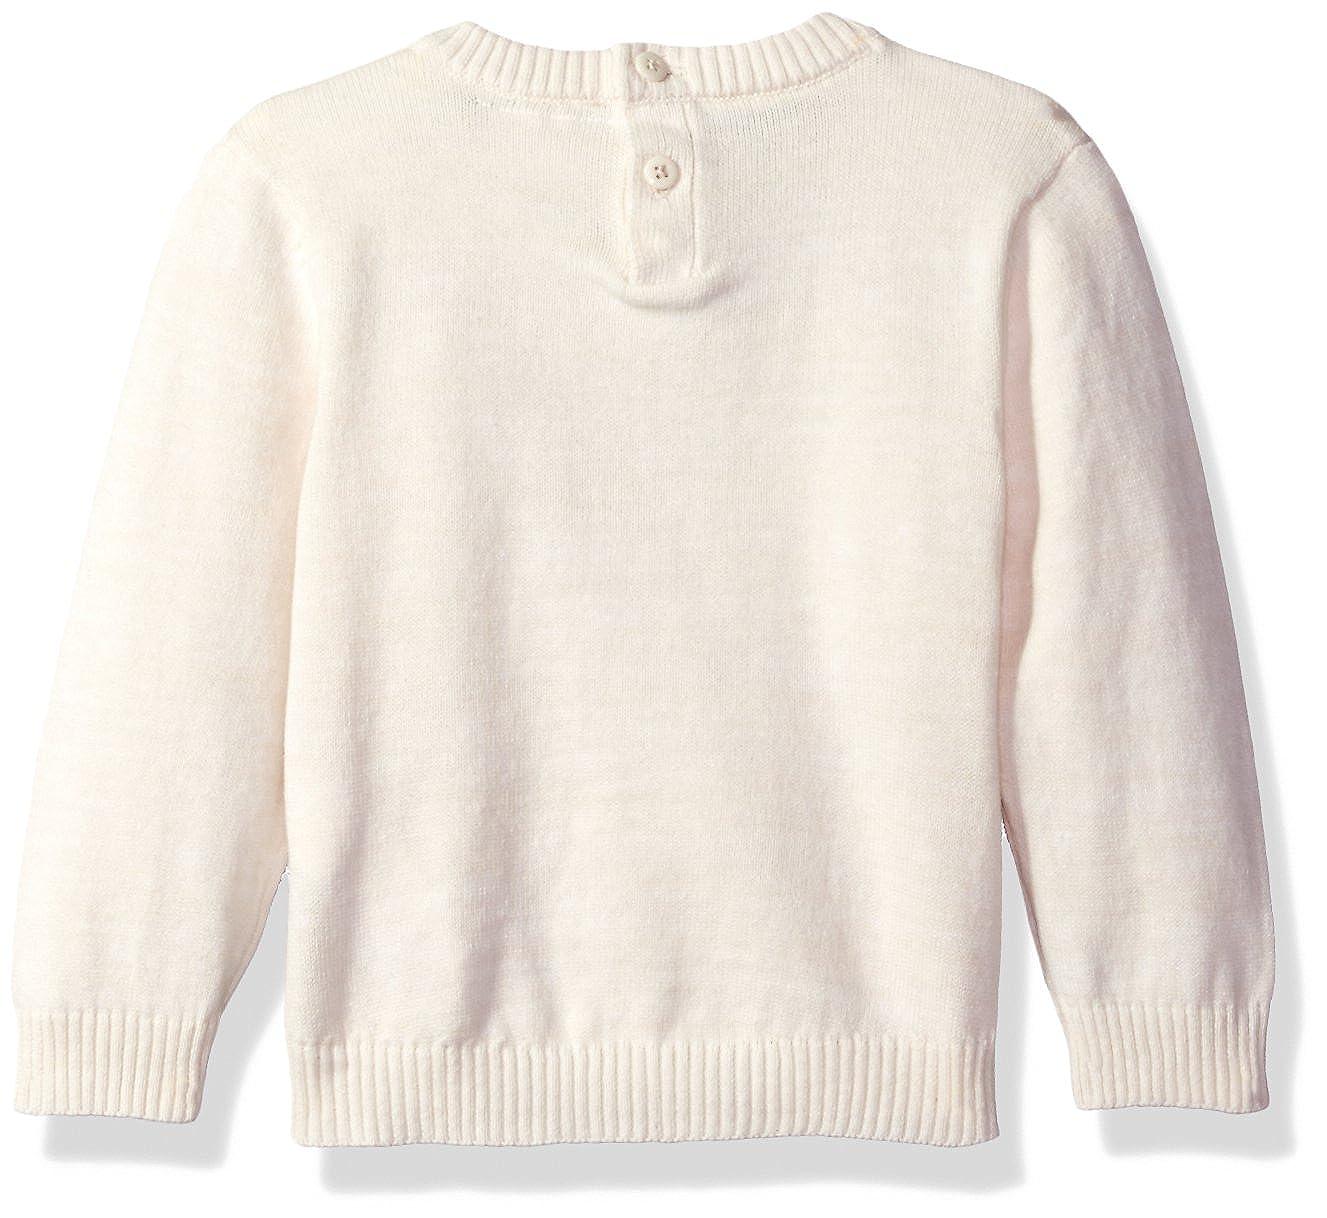 18M Rosie Pope Girls Baby Tees /& Sweater Tops White